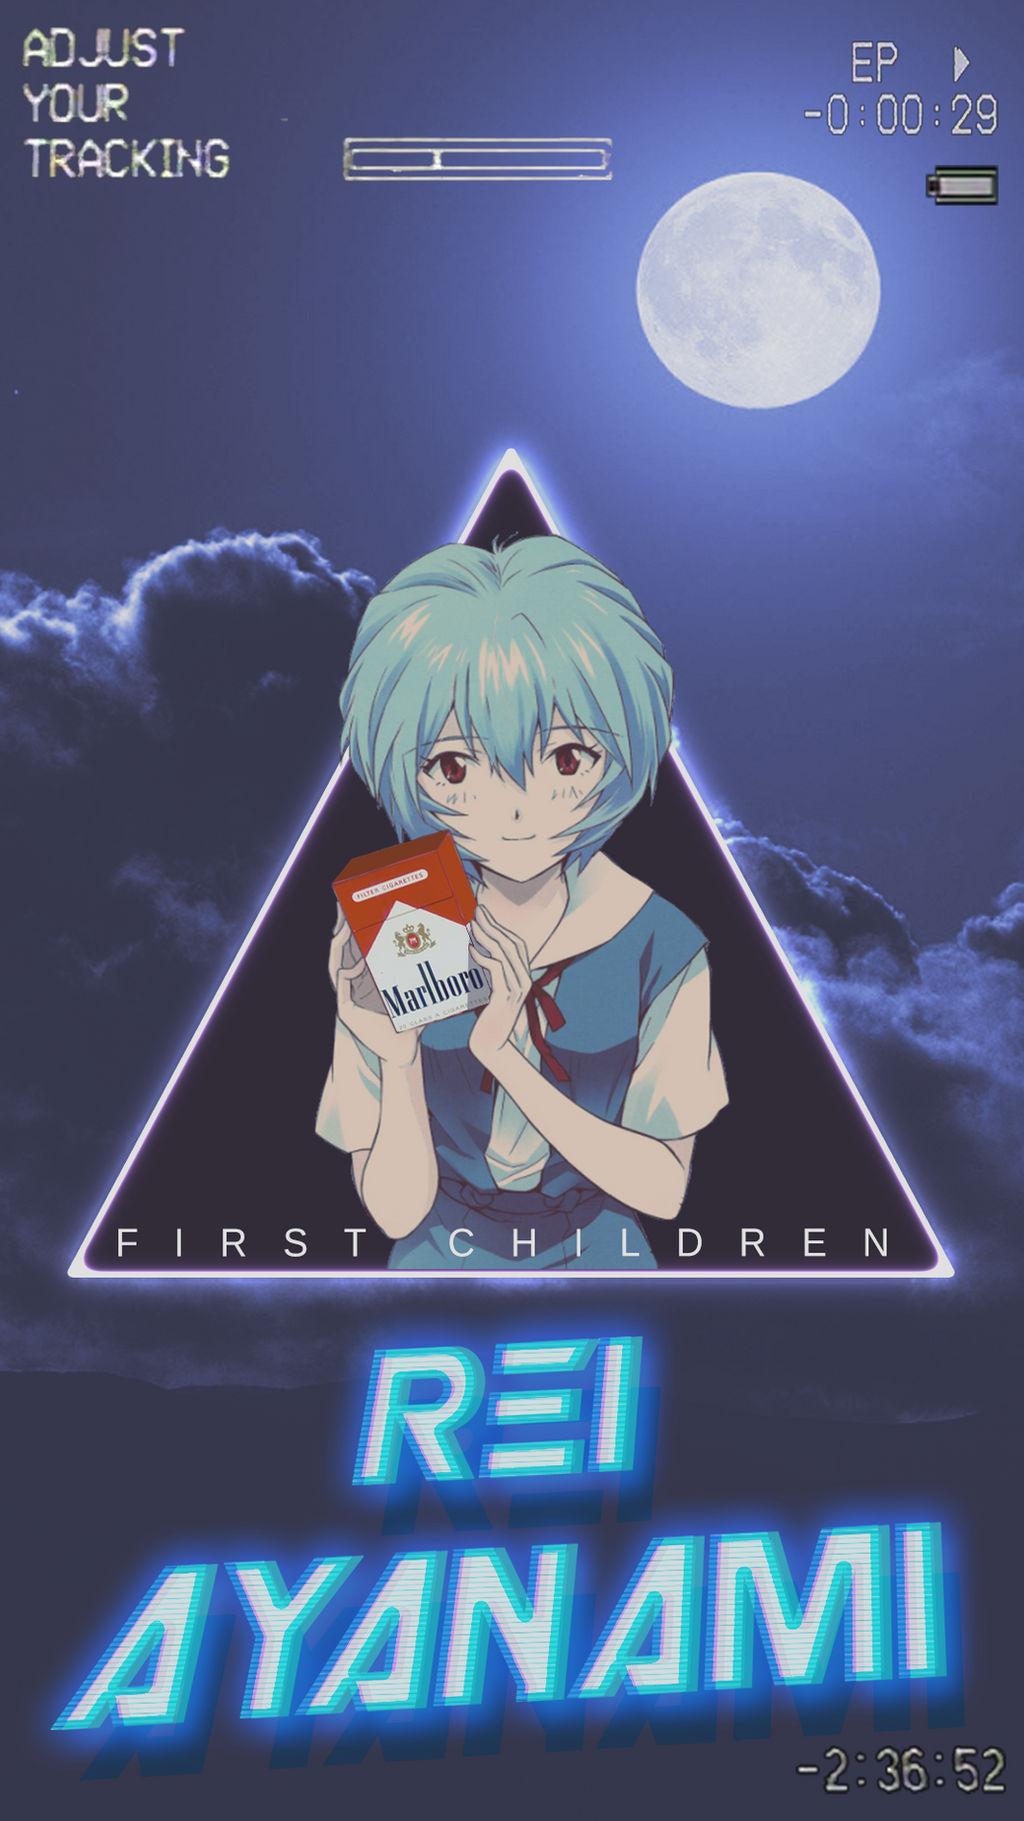 Rei Ayanami Cellphone Wallpaper By Jesucristoasterisco On